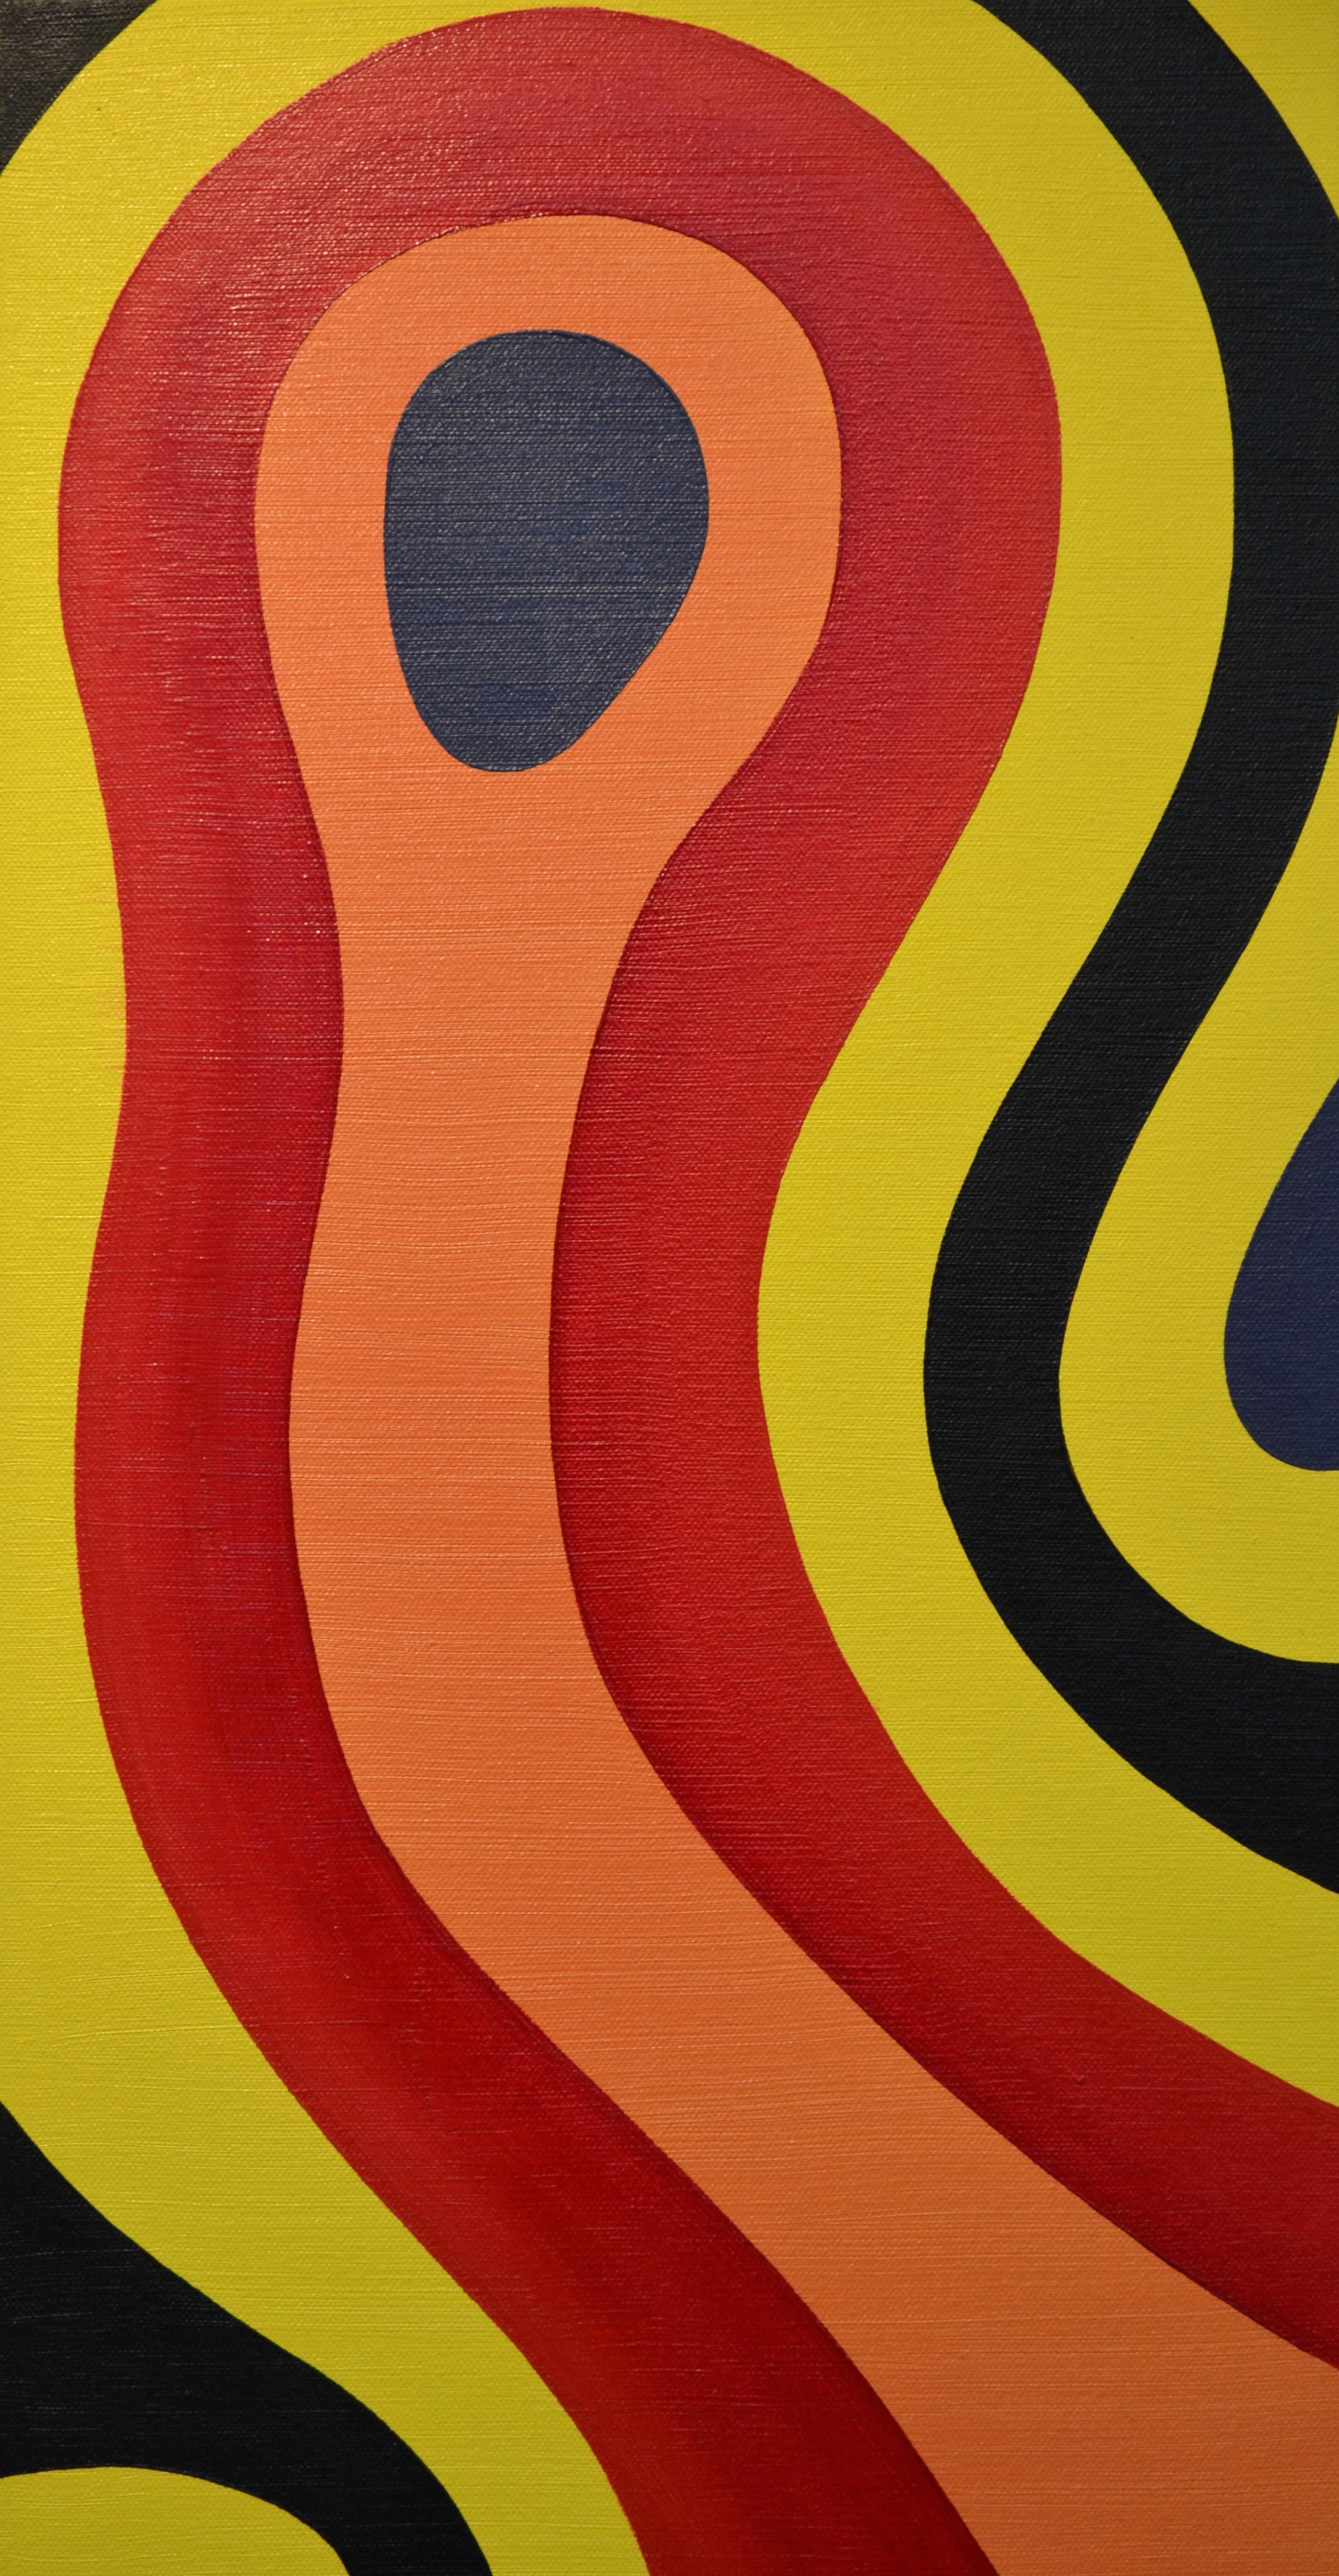 Armand Fogels-_Off Target_-12x24-oil-1st-2013-1500.00.jpg